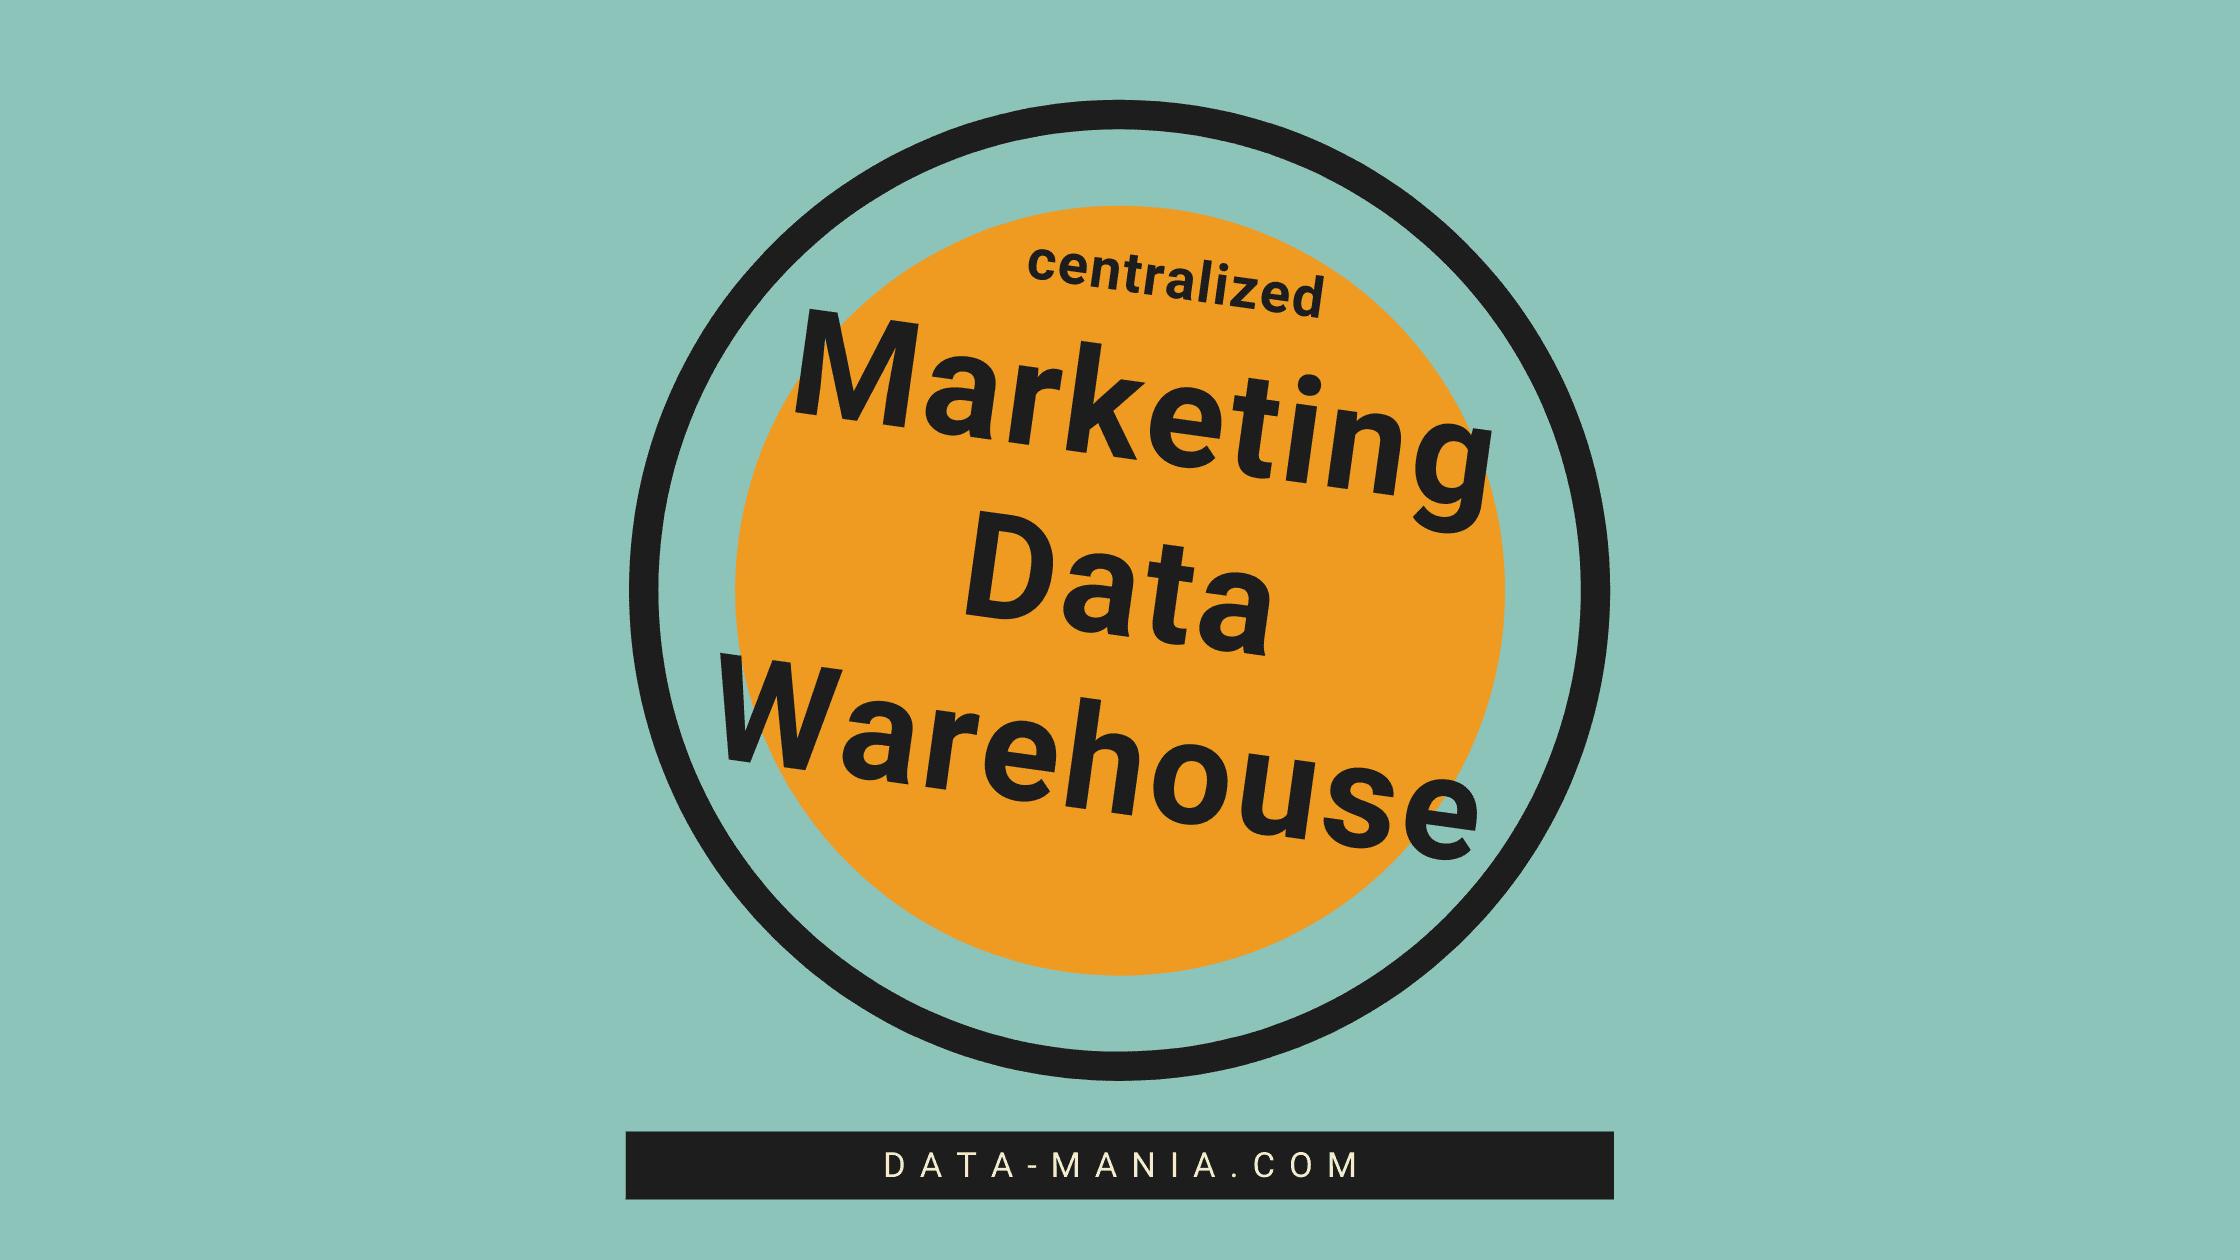 Centralized Marketing Data Warehouse